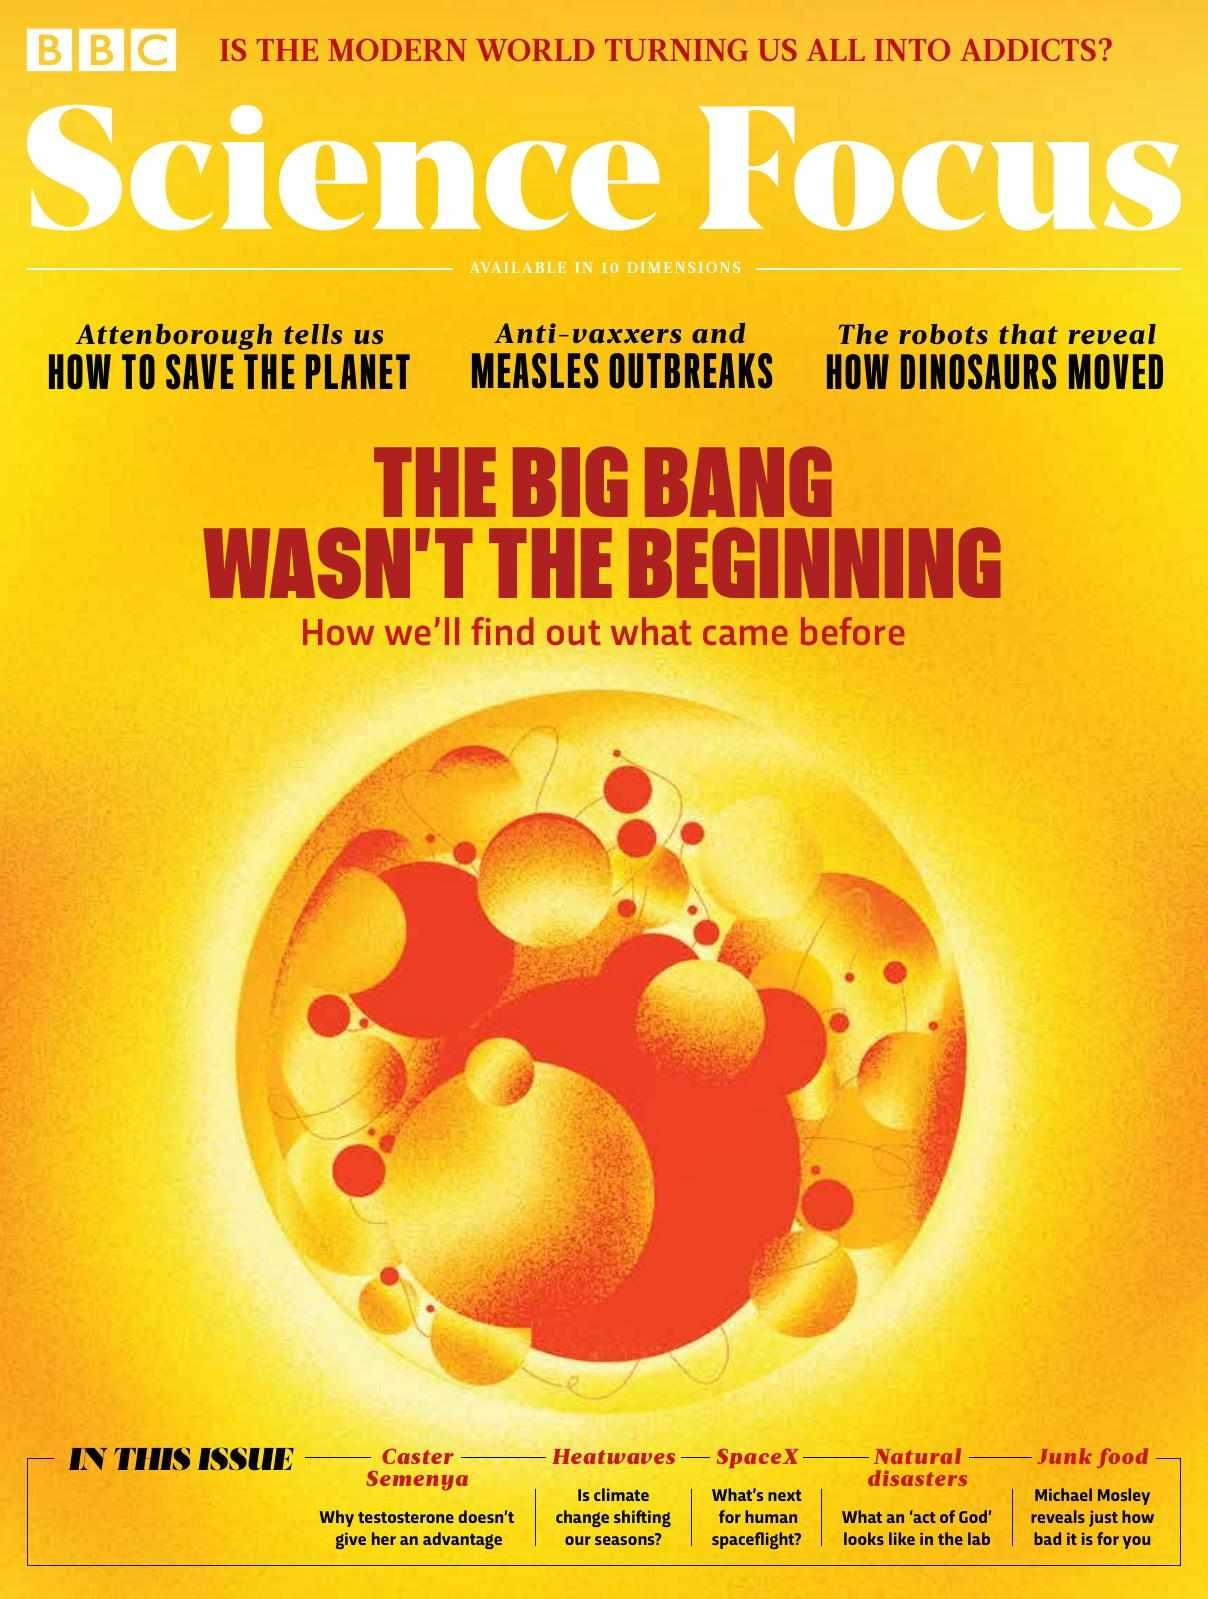 The Big Bang wasn't the beginning